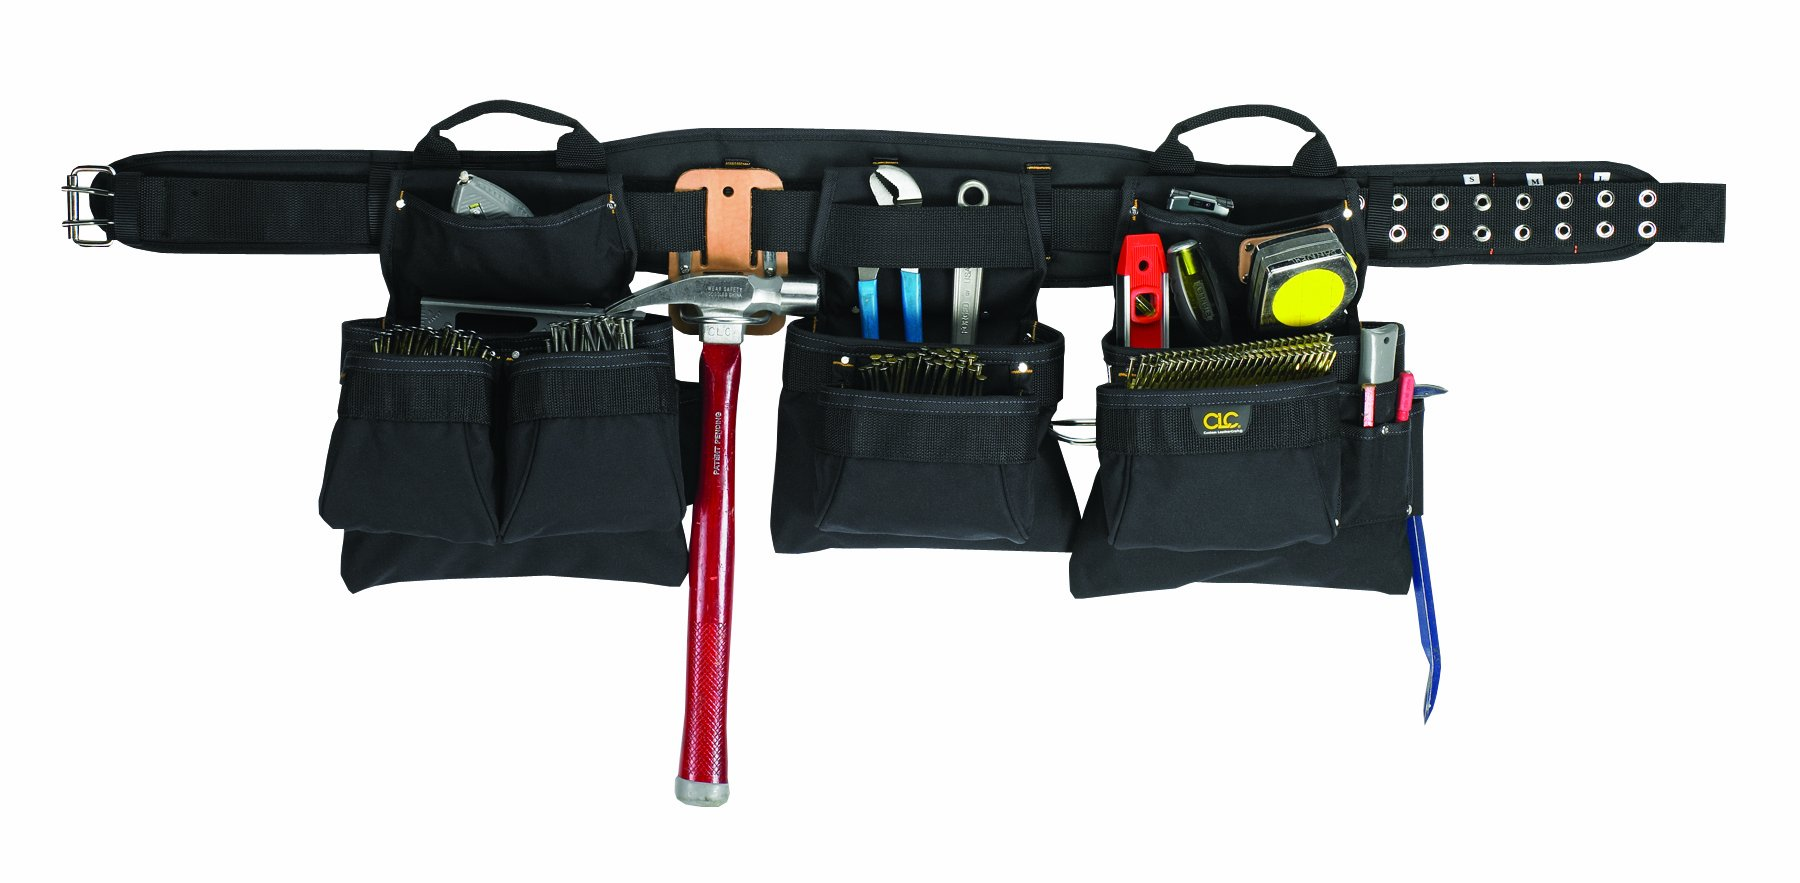 CLC Custom Leathercraft 5605XL Professional Carpenter's Combo, black, 18-Pocket 5 Piece, Extra Large